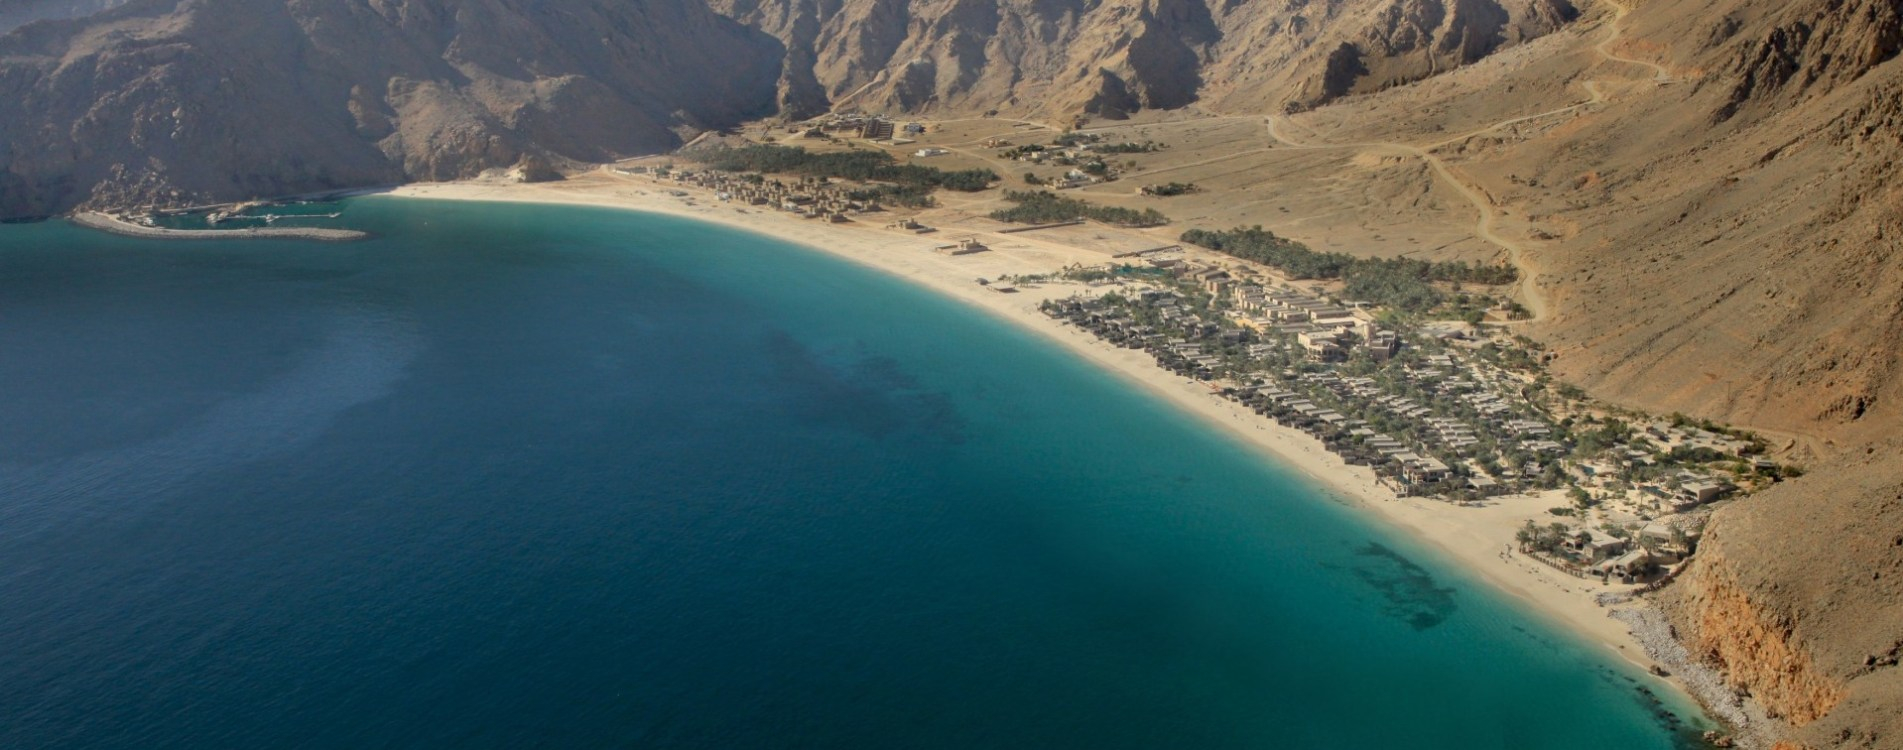 Six-Senses-Zighy-Bay-Arieal-View-Luftbild-Panorama-Küste-Oman.jpg